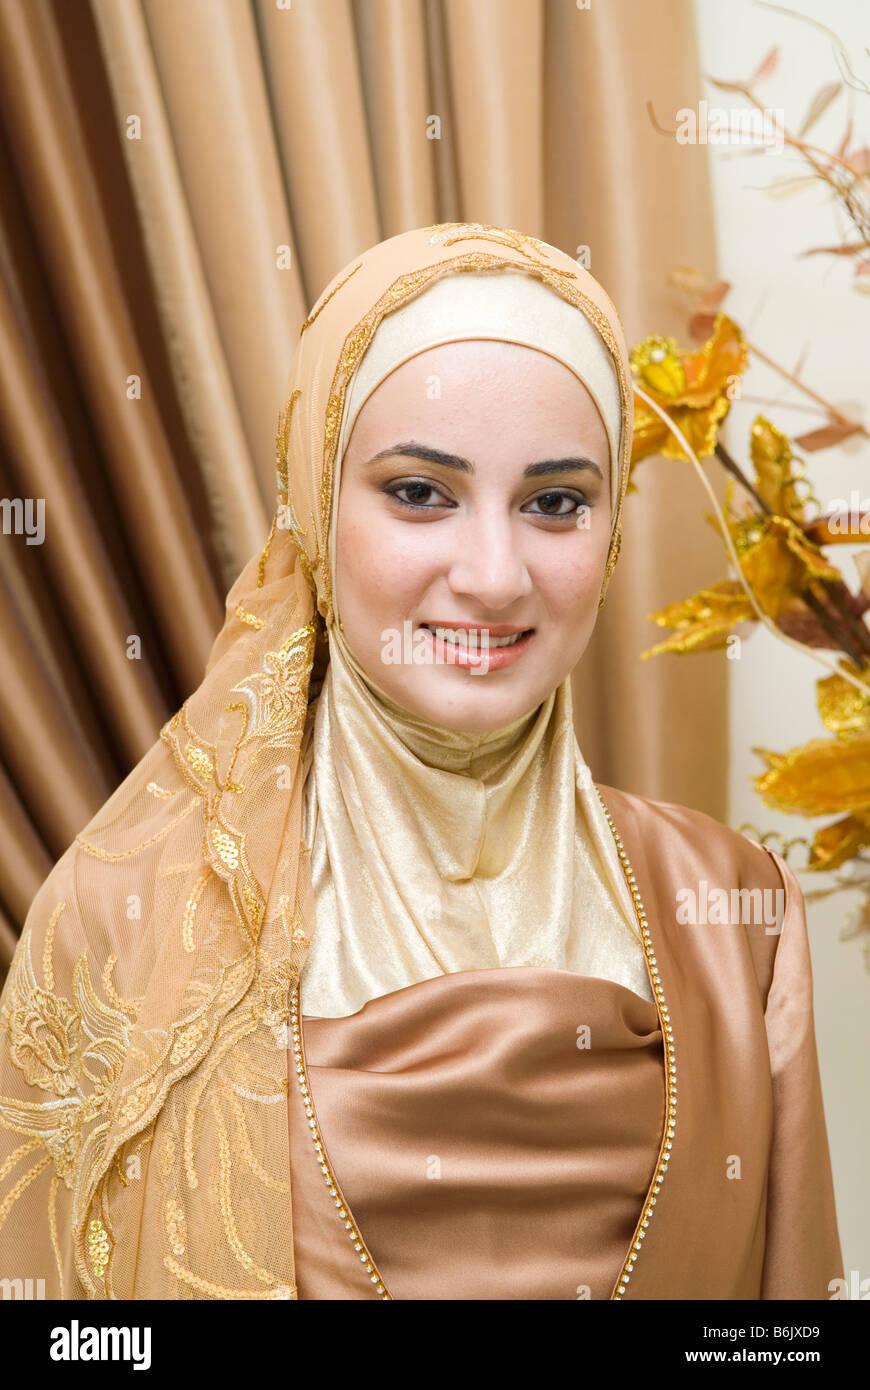 Portrait of a beautiful young Muslim woman wearing Hijab Stock Photo